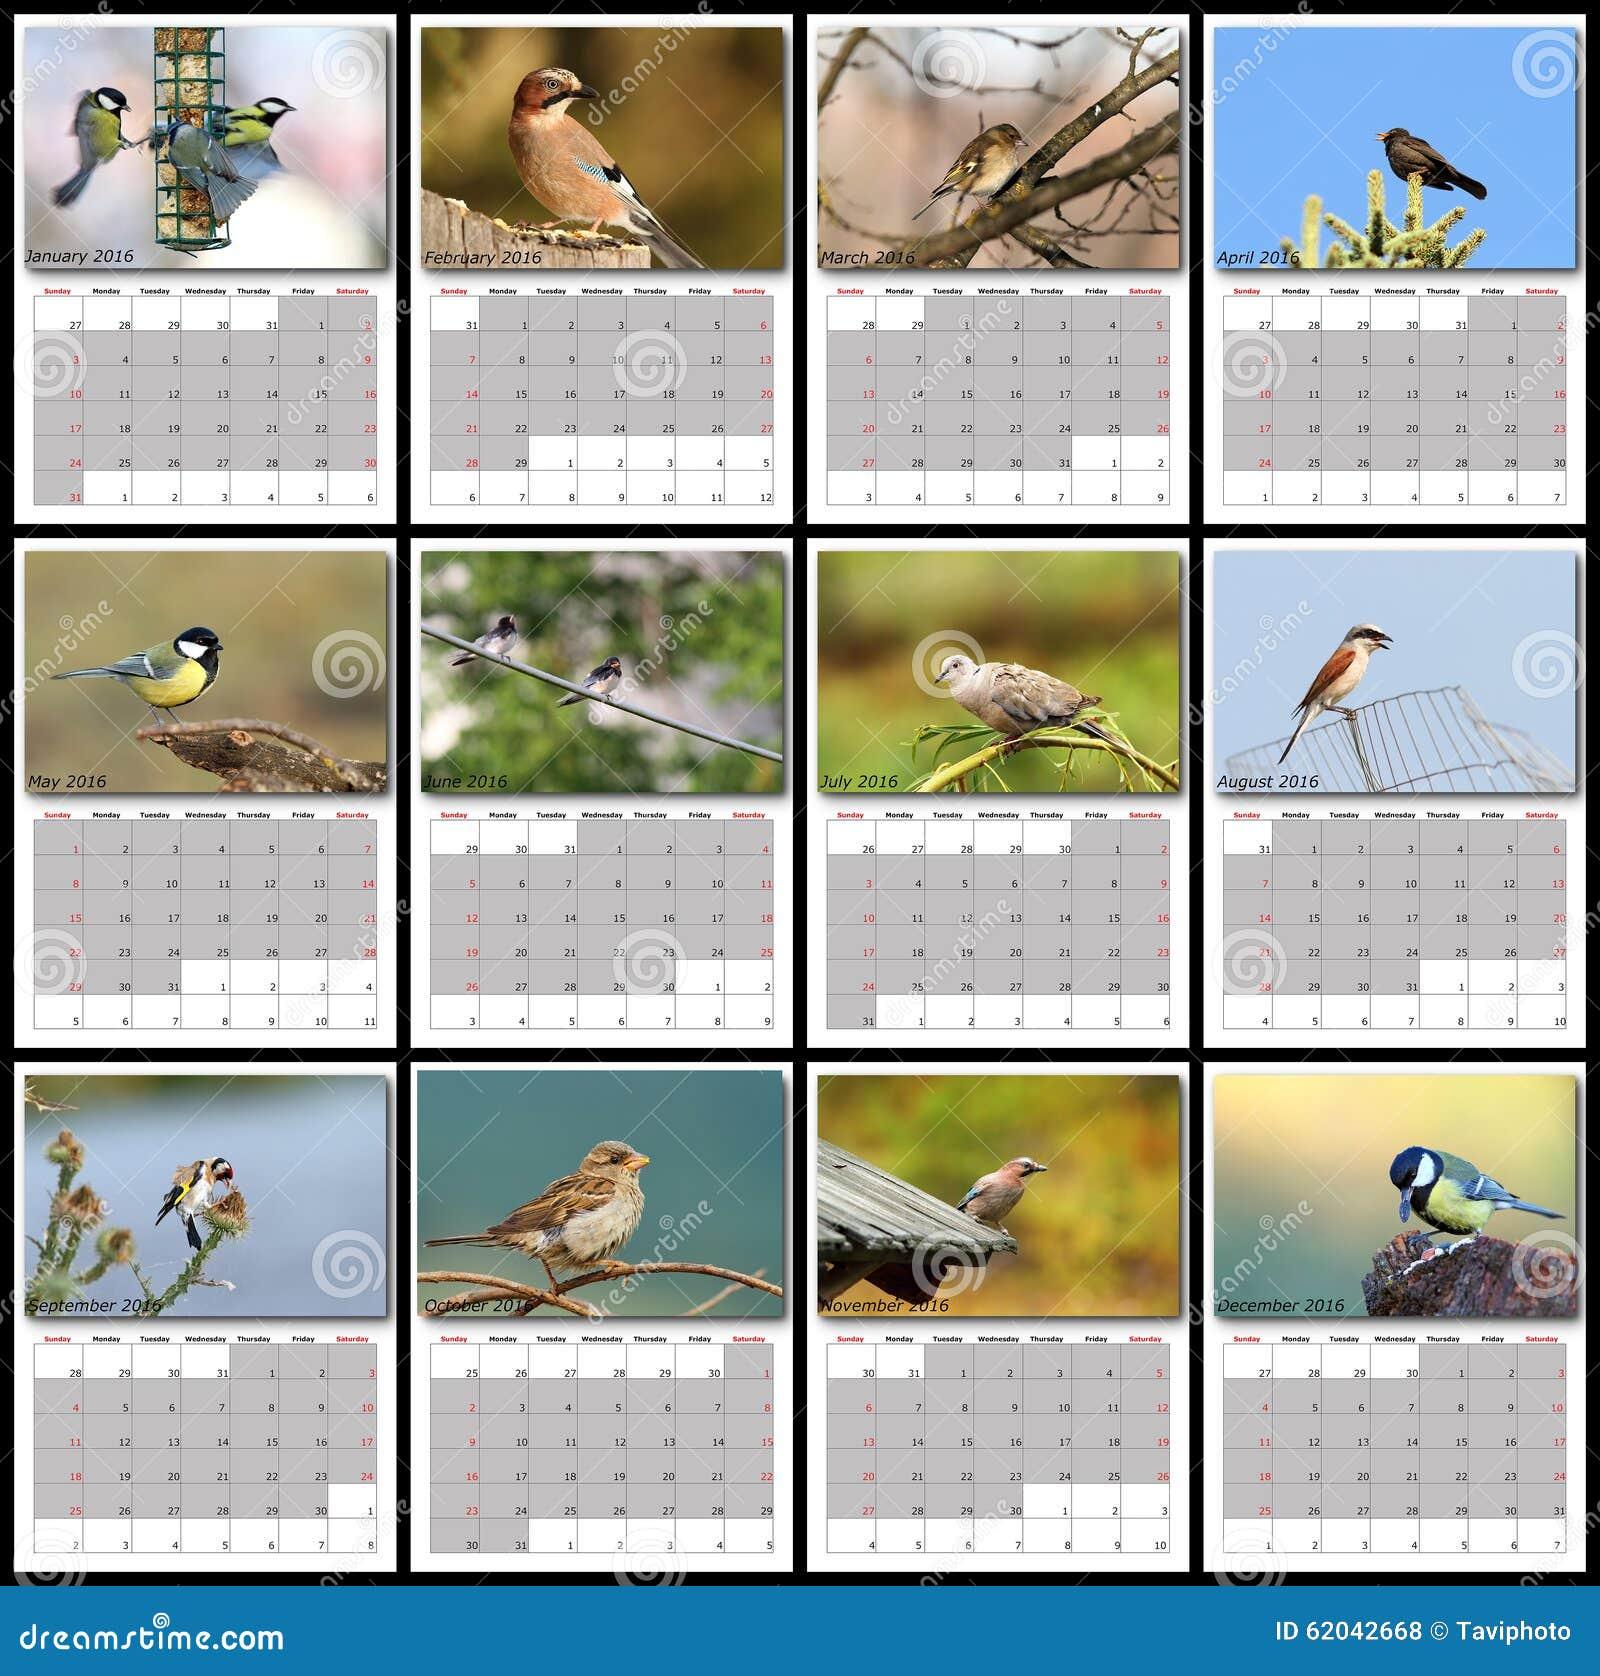 Garden birds calendar year 2016 stock photo image 62042668 for Gardening 2016 calendar